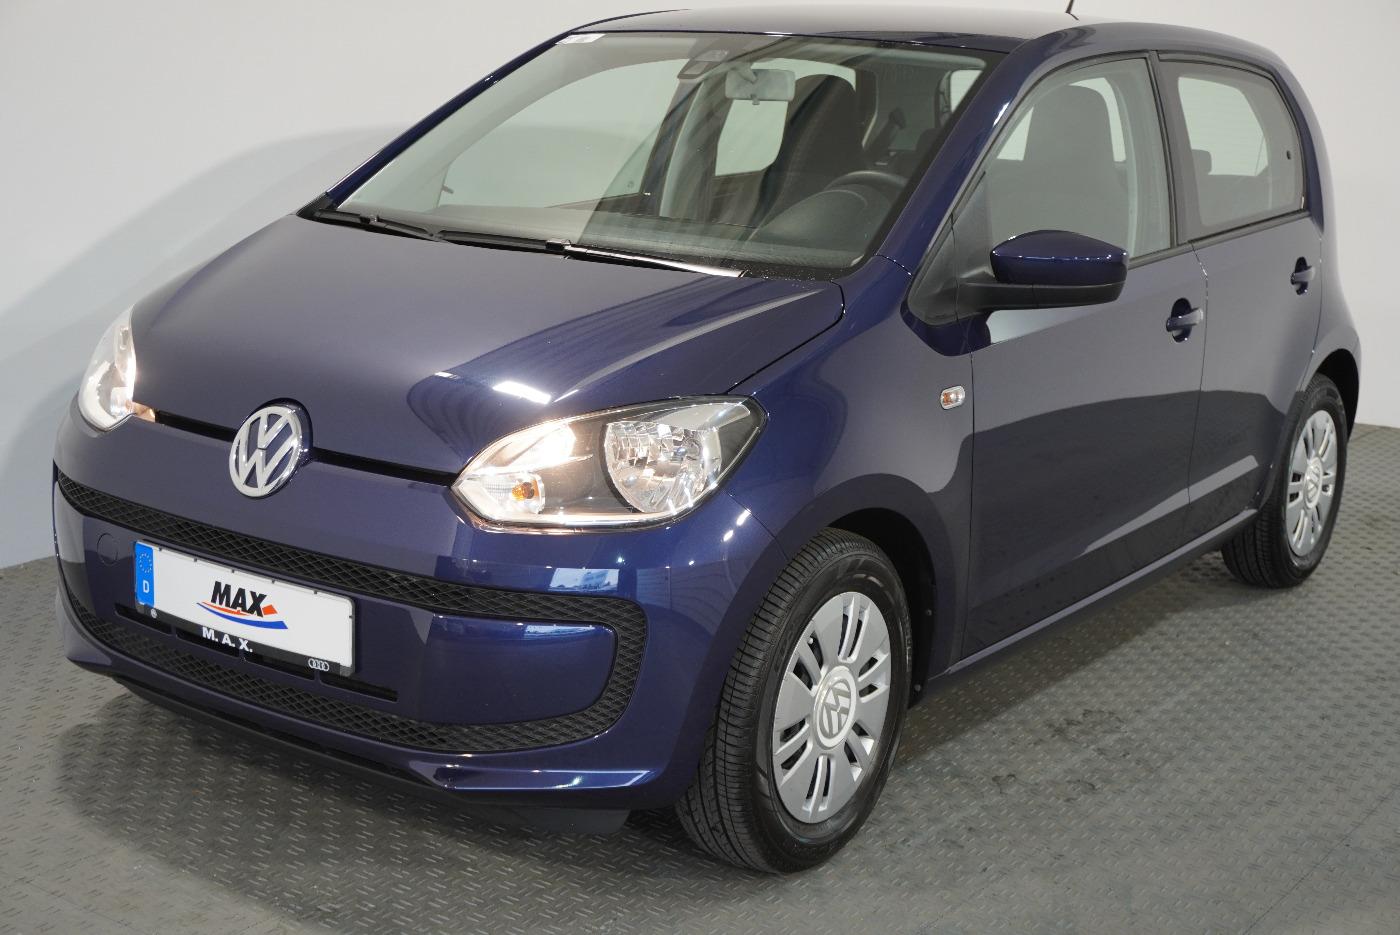 Volkswagen up! 1.0 move up! EU6 4-Türer 1.0 KLIMA PDC, Jahr 2016, Benzin